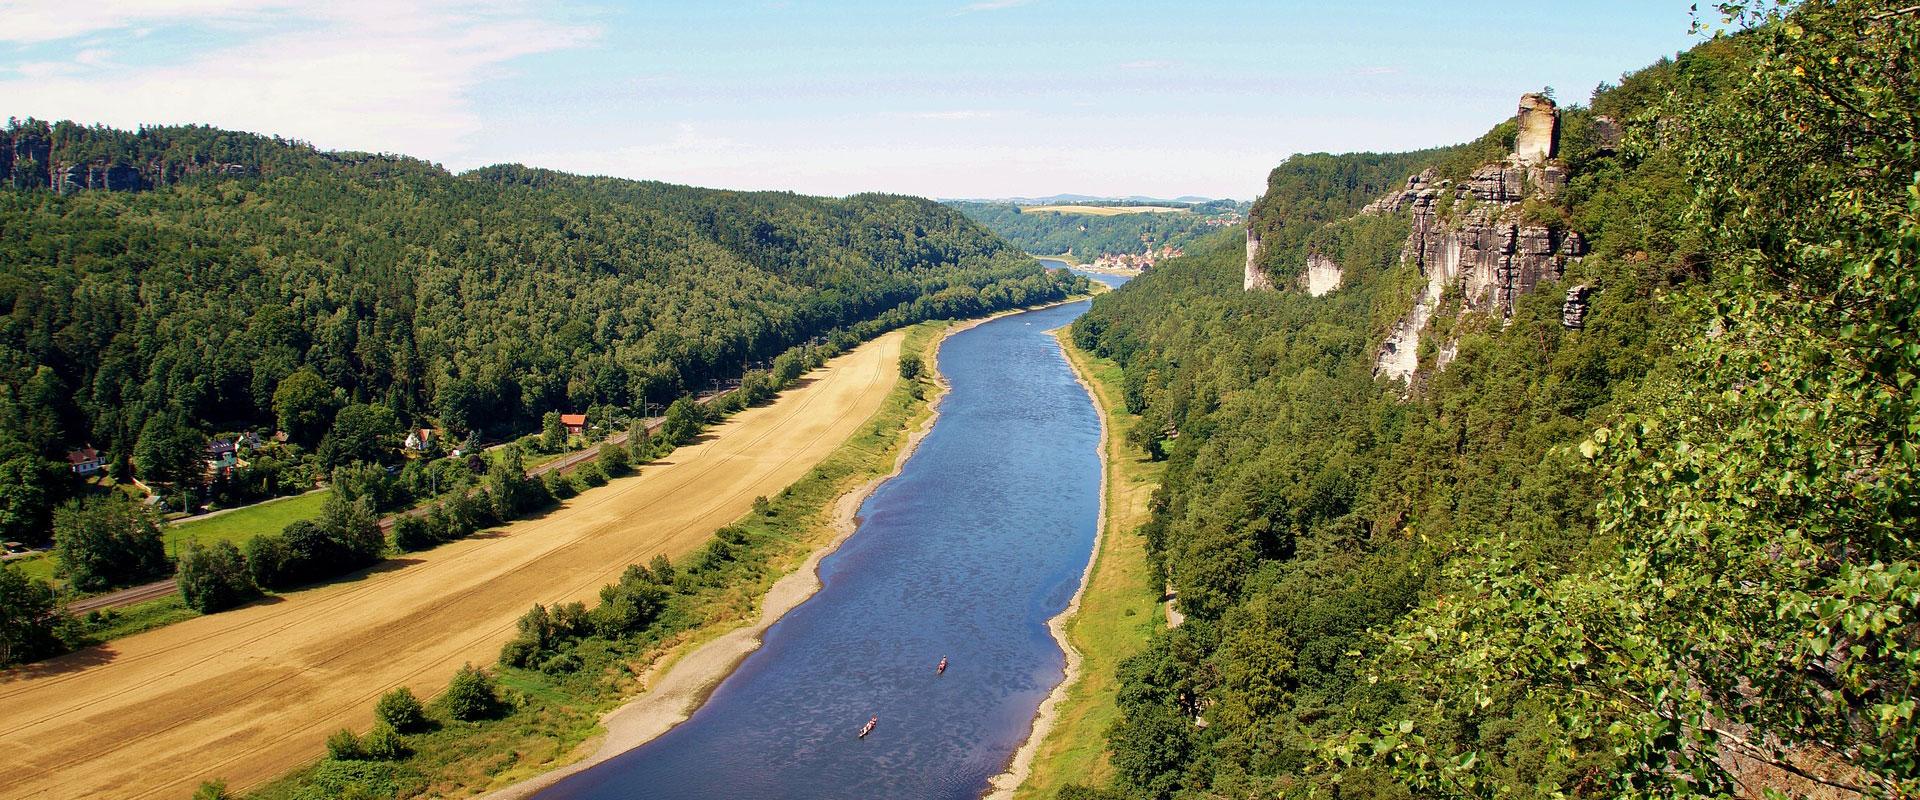 Elberadweg: Bad Schandau-Dessau